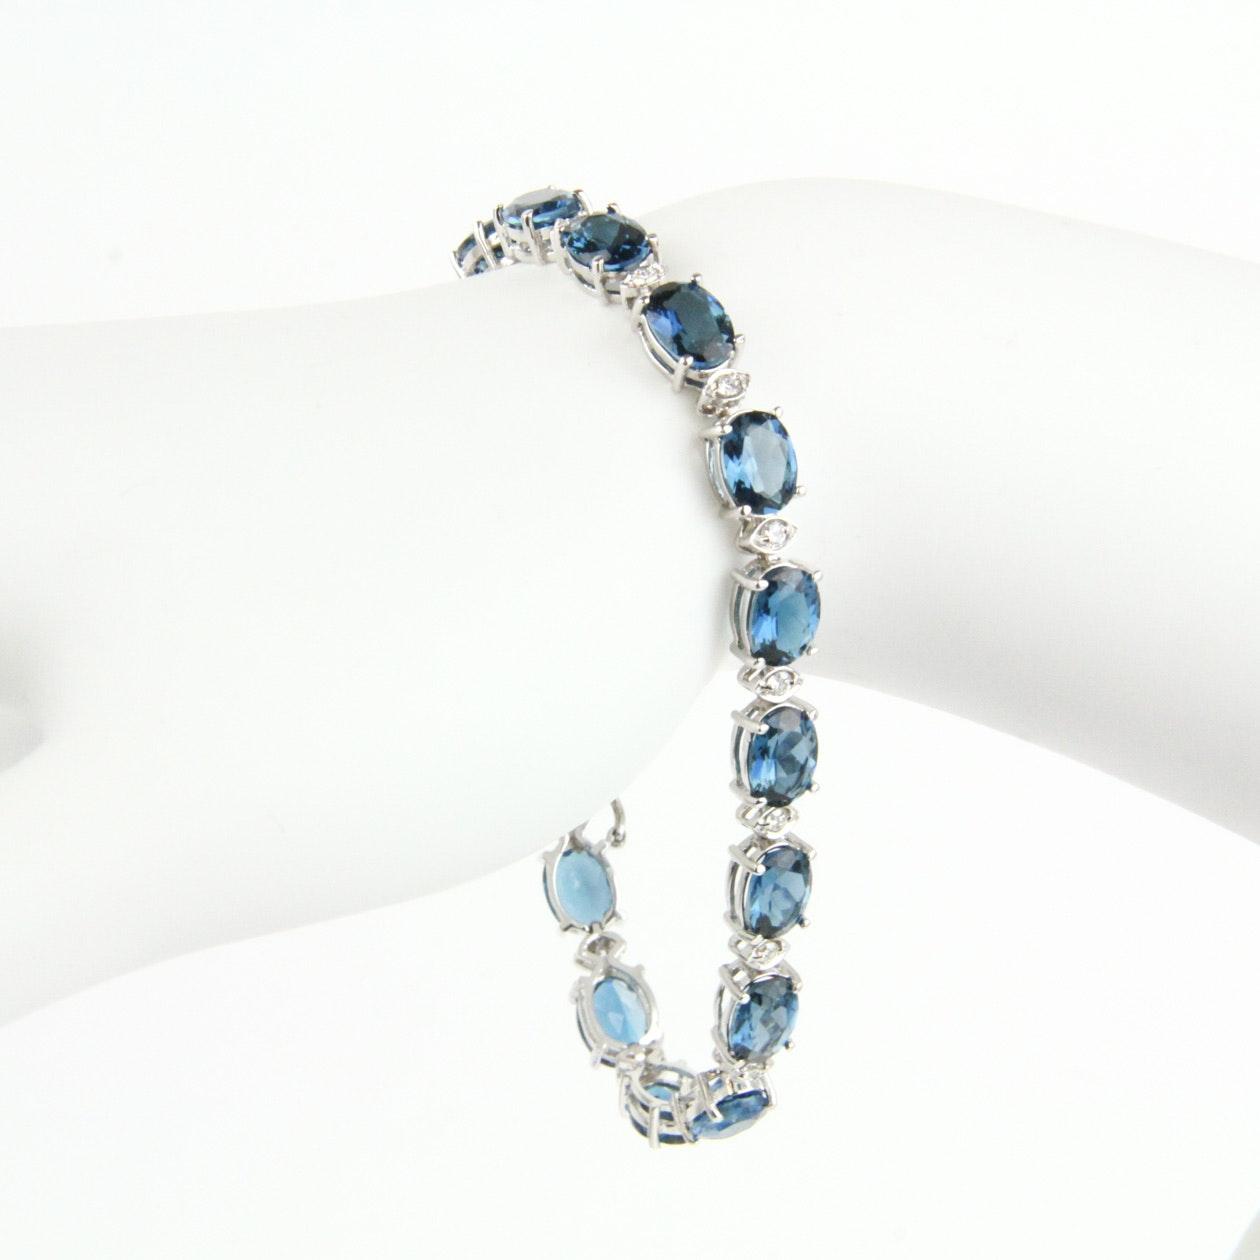 14K White Gold, Blue Topaz, and Diamond Bracelet